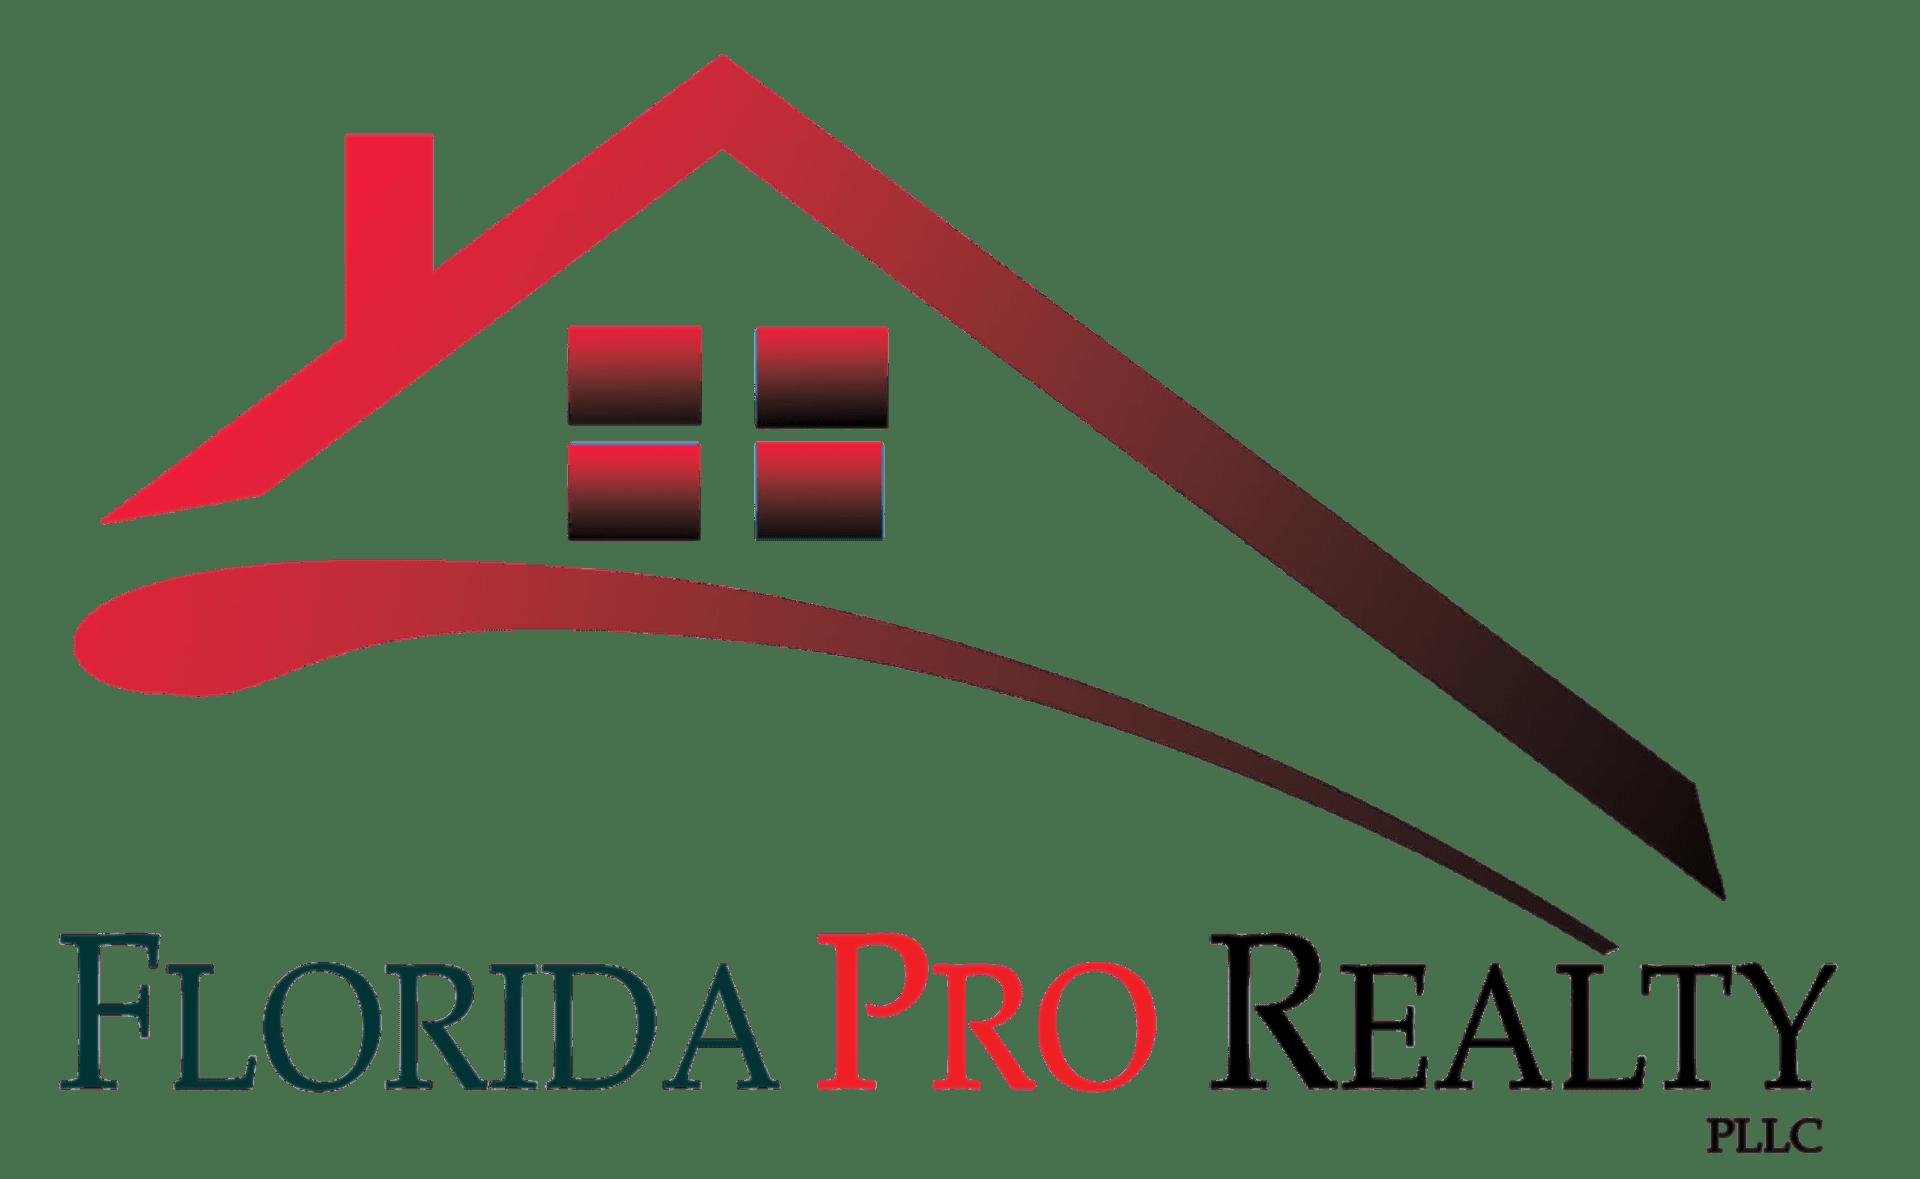 Florida Pro Realty